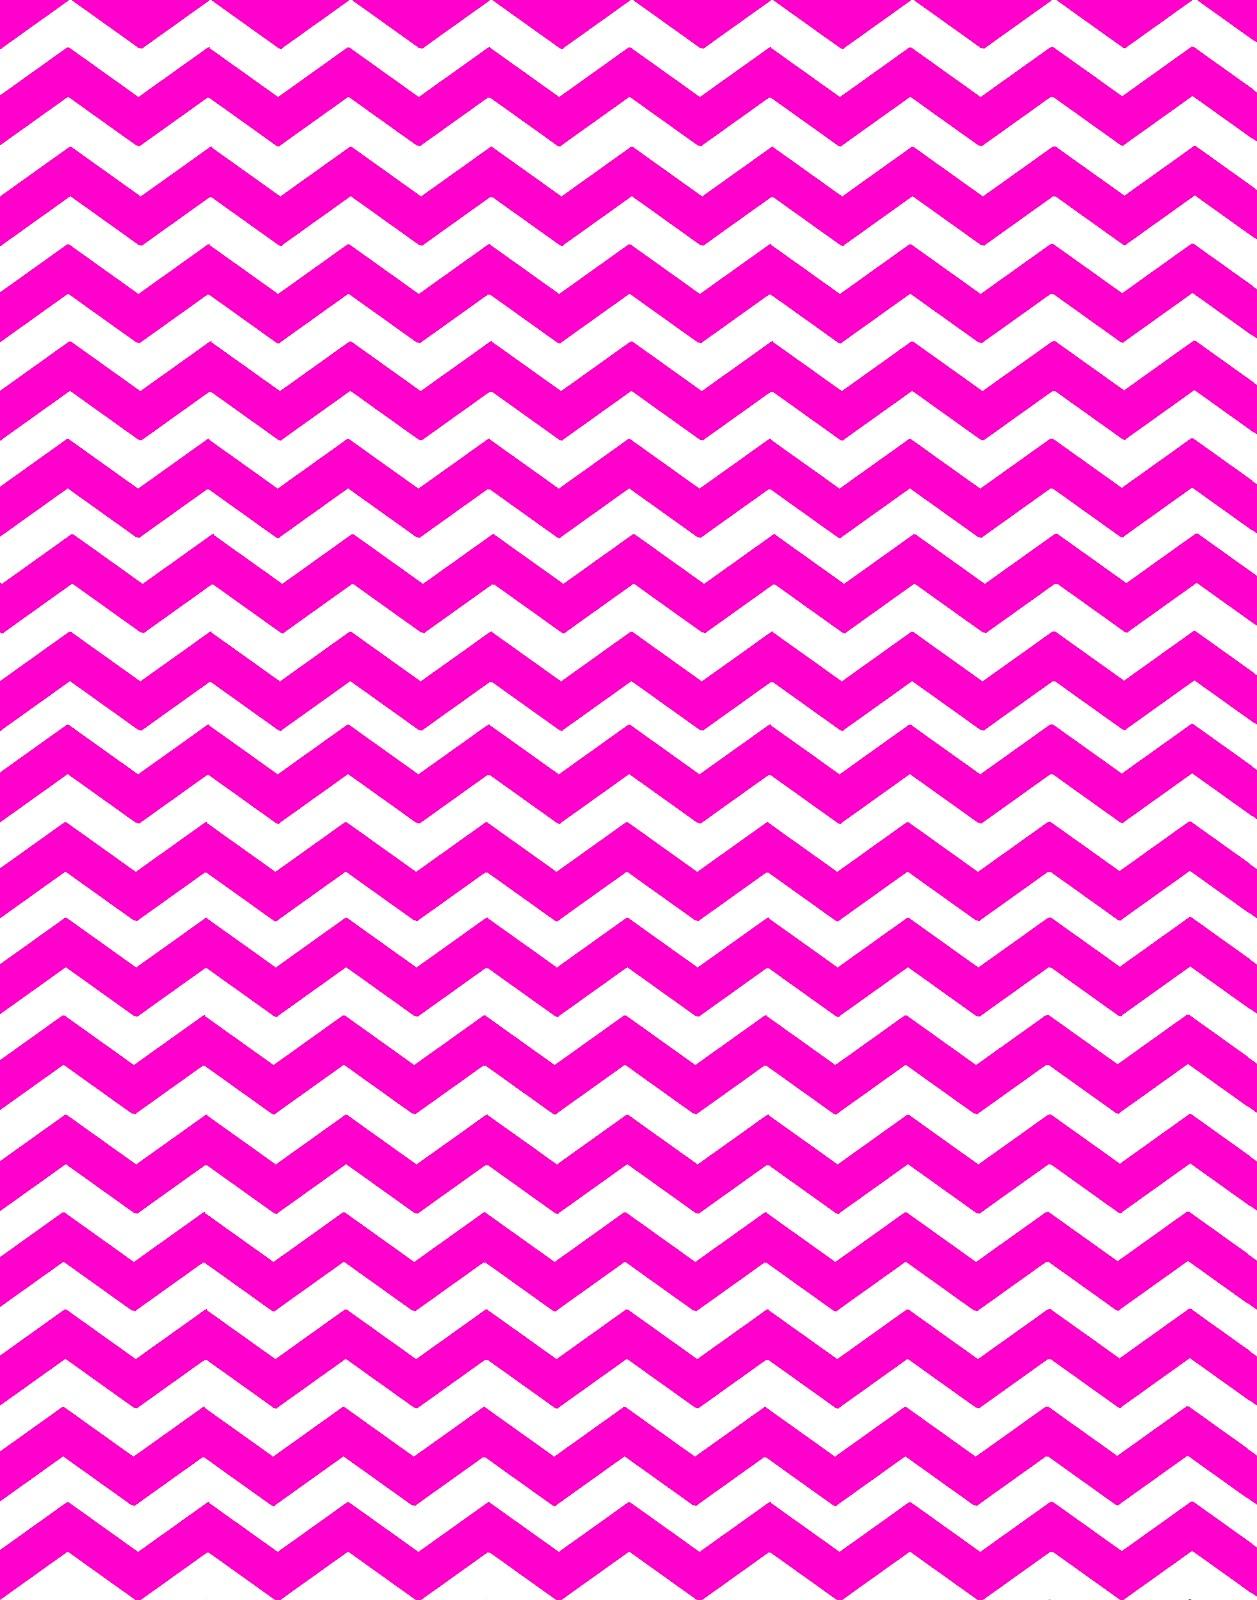 Pink Chevron Wallpaper - WallpaperSafari